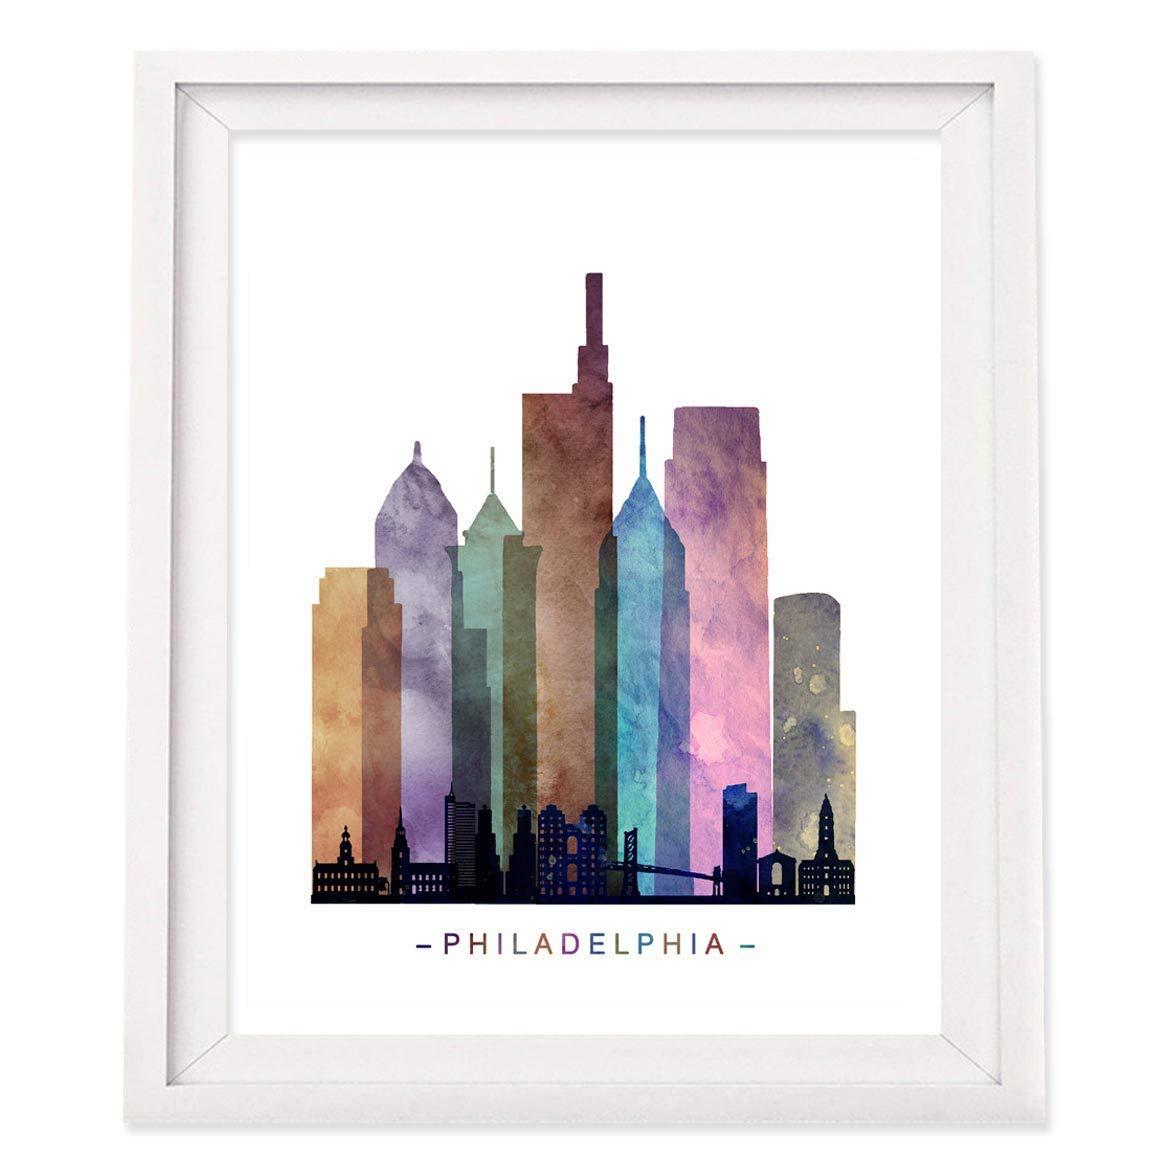 Pennsylvania Batik painting watercolor painting art Philadelphia skyline artwork watercolor batik Philly Philadelphia City Hall at dawn